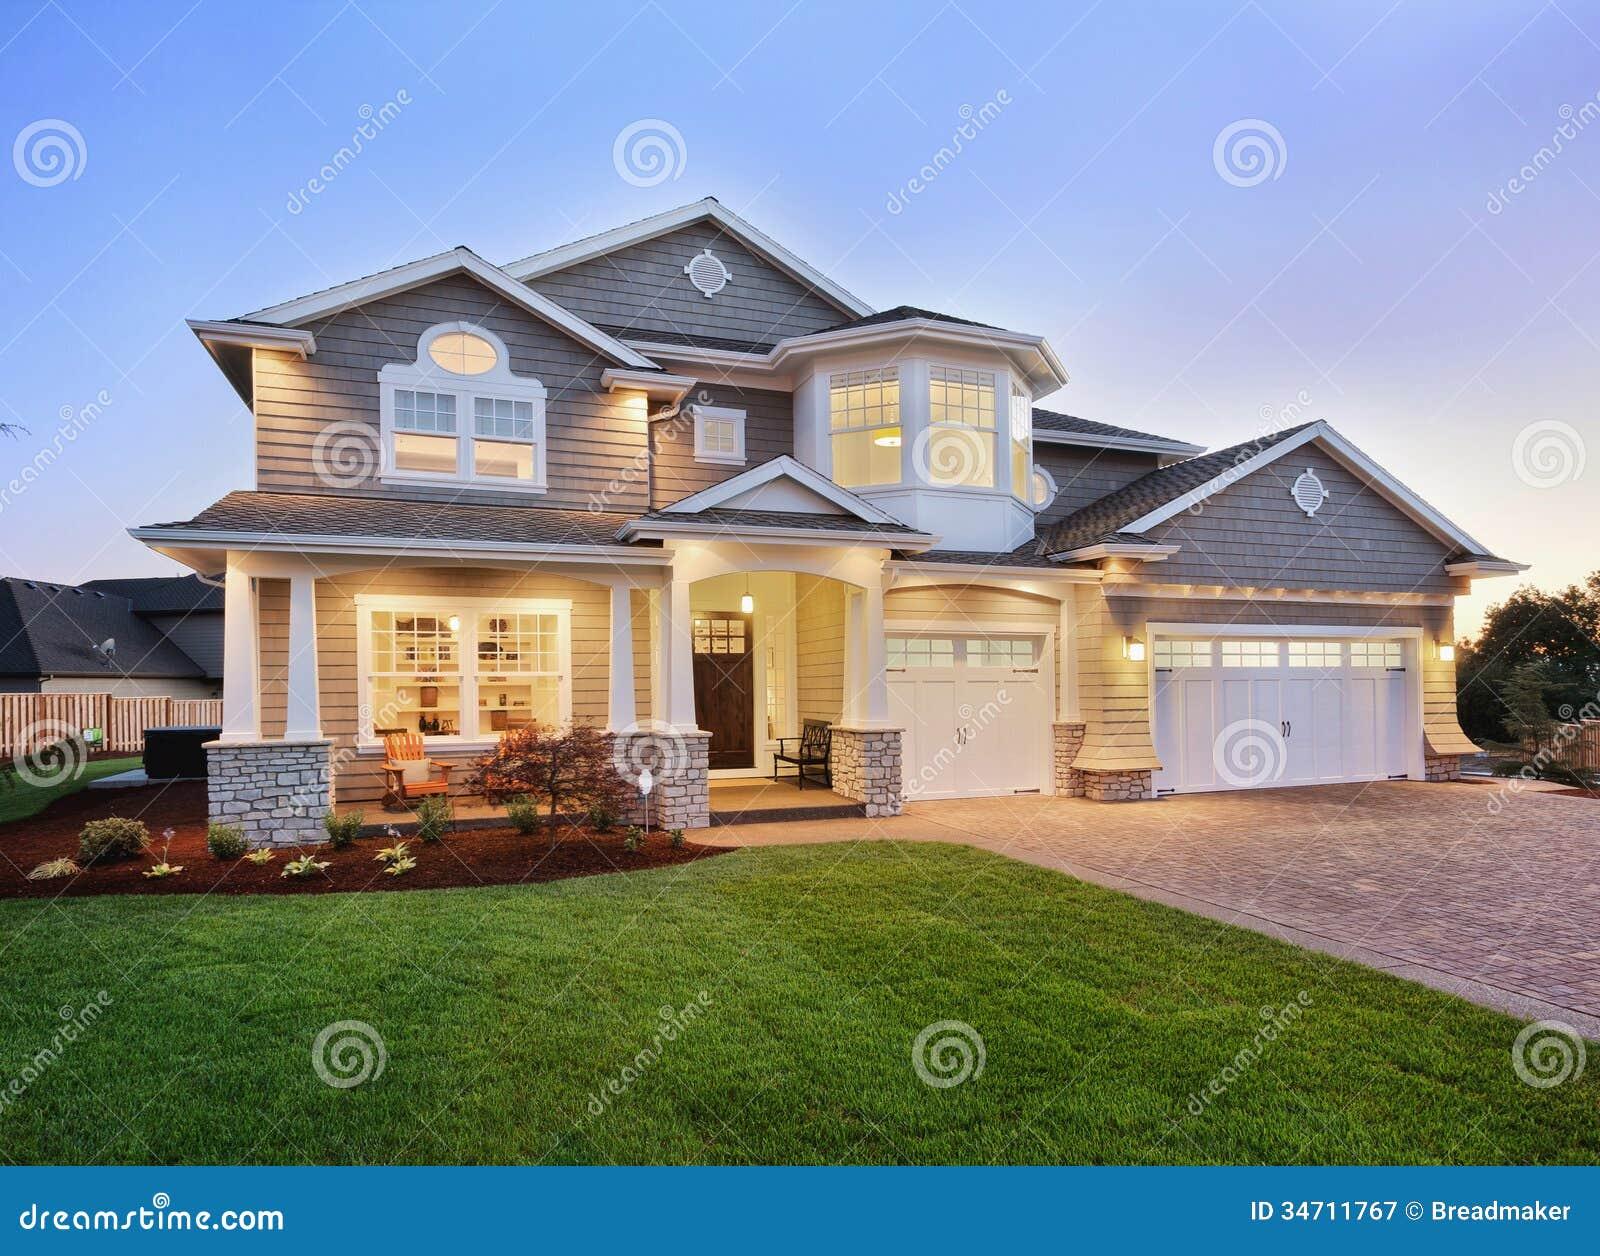 Modern luxury homes exterior -  Luxury Stone Homes Exterior